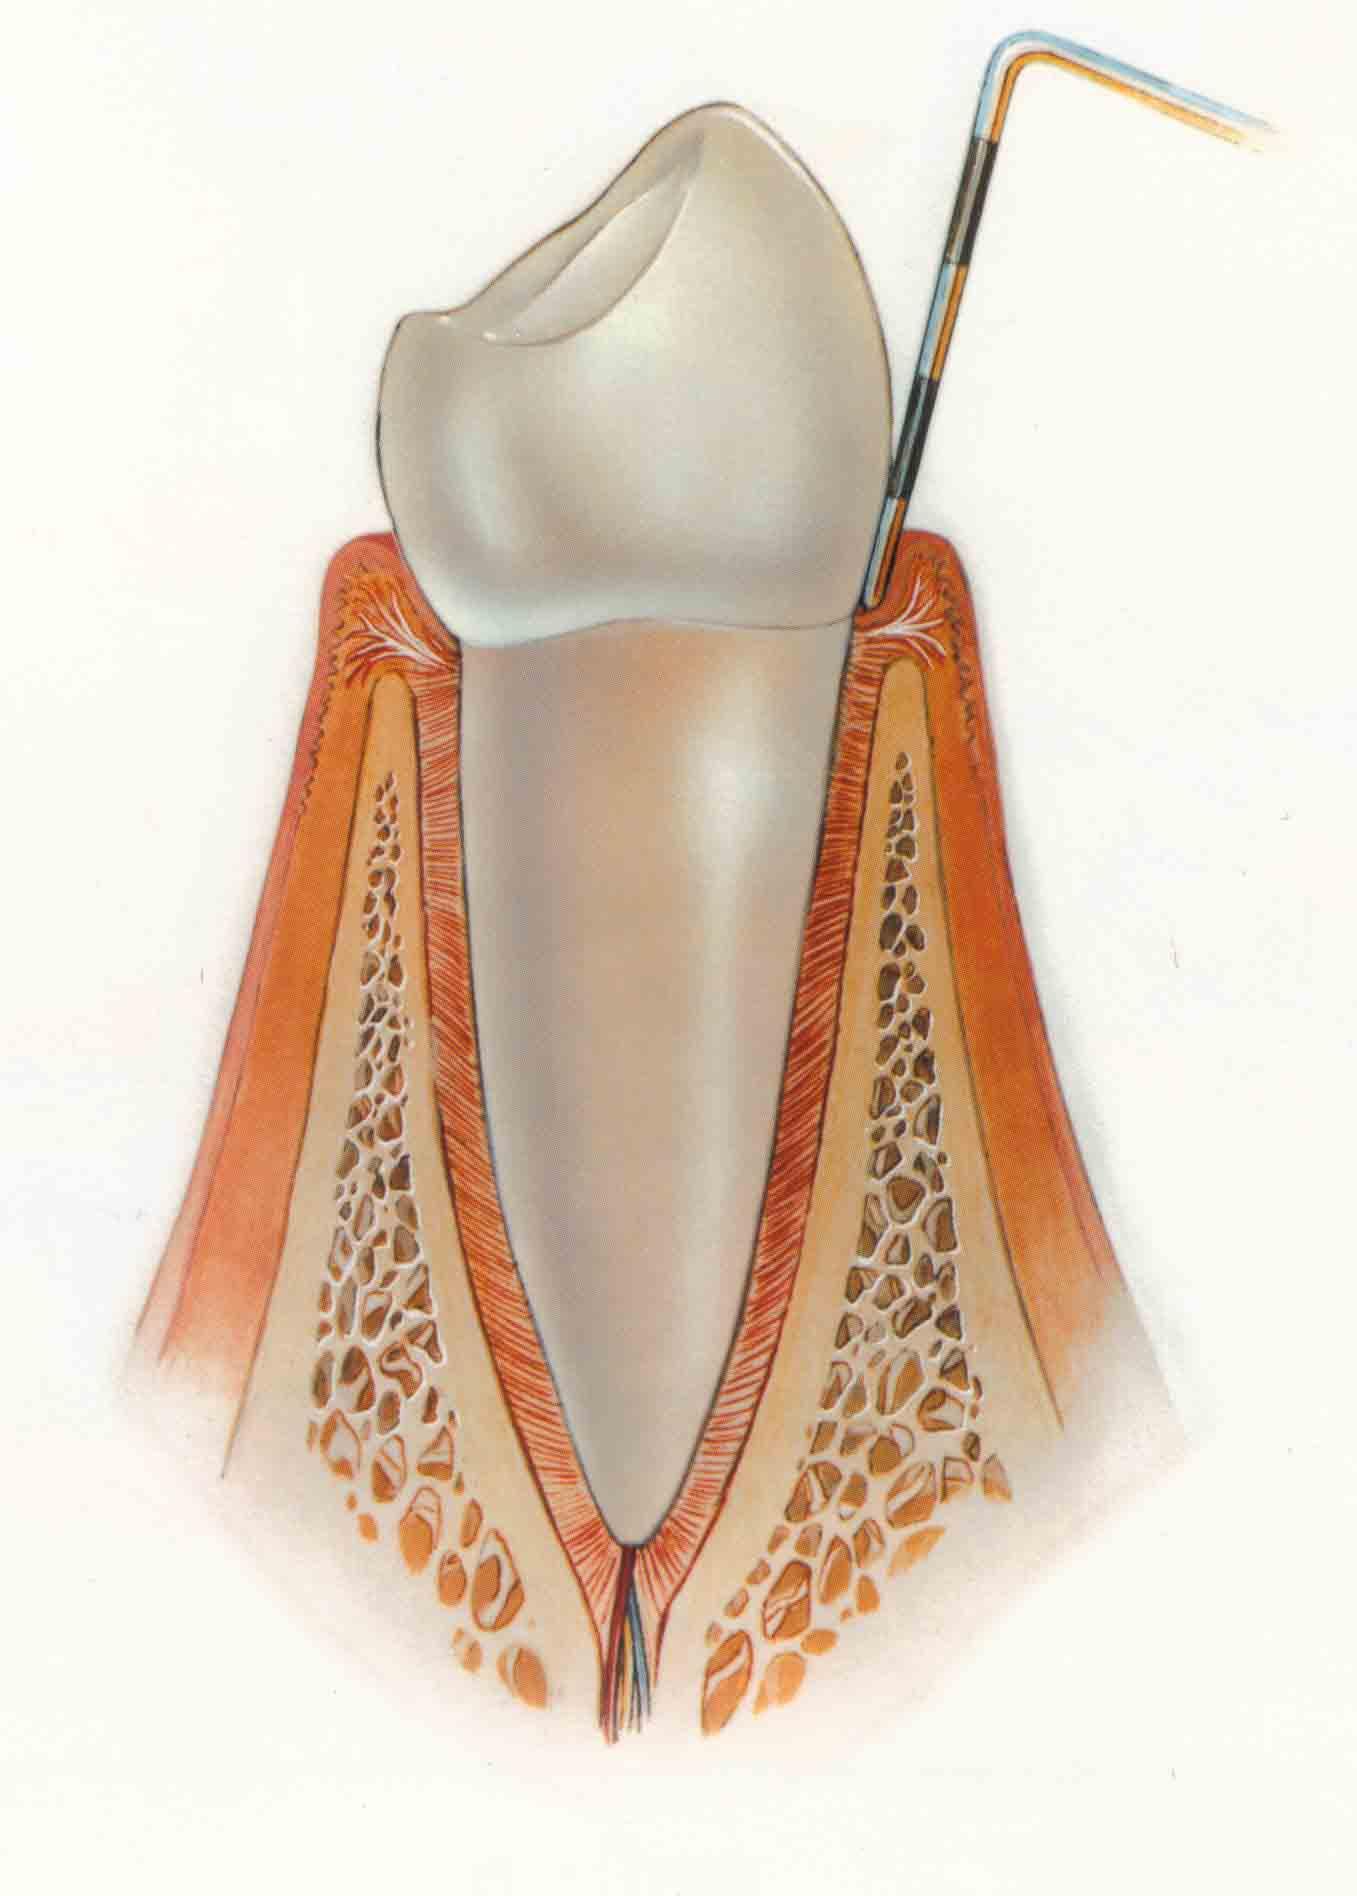 Gingivitida - meranie hĺbky ústupu kosti